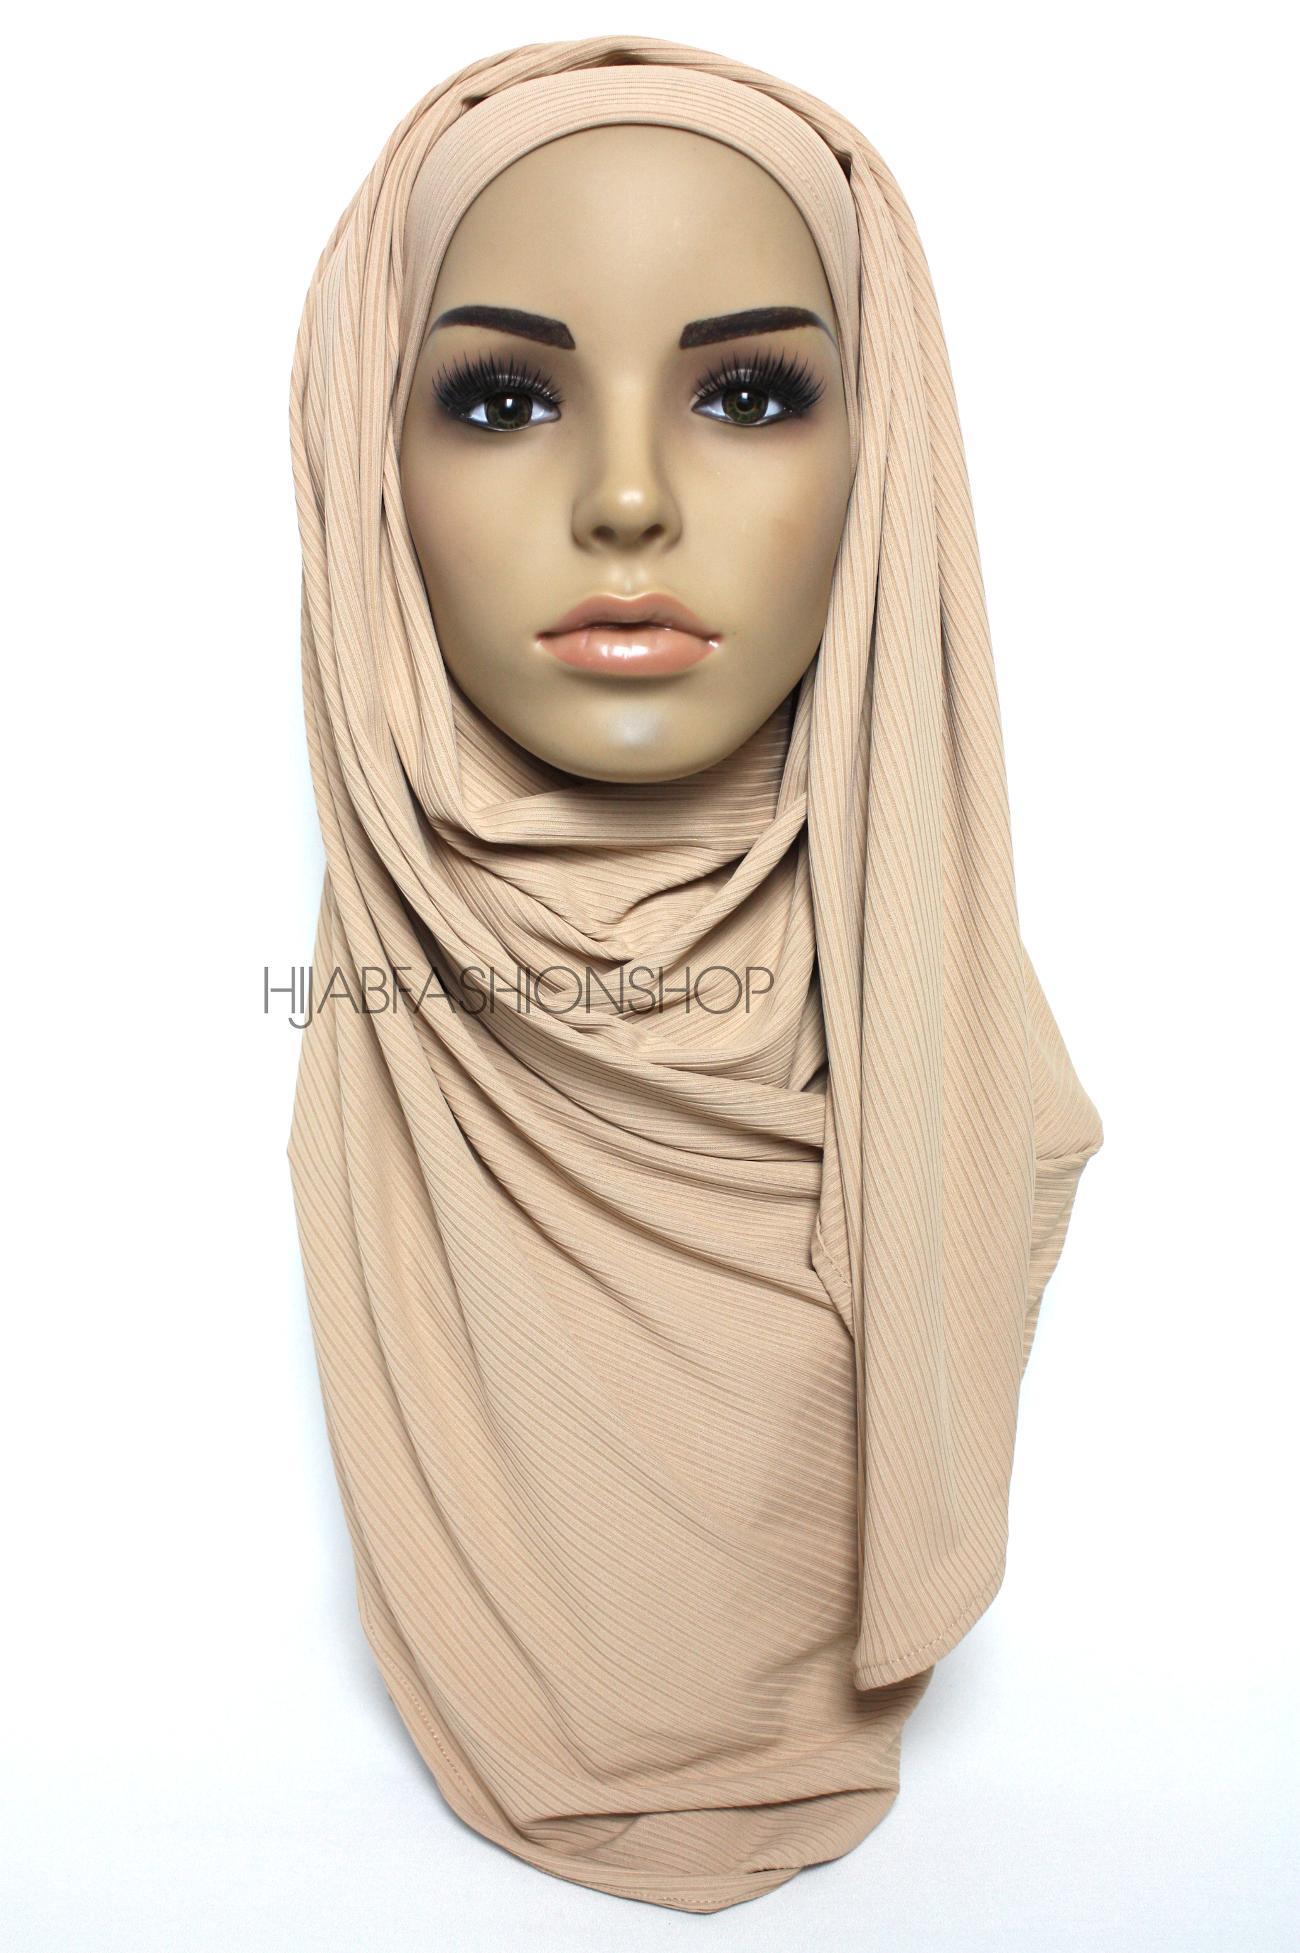 Nude Rose Jersey Hijab - Hijab Fashion Shop